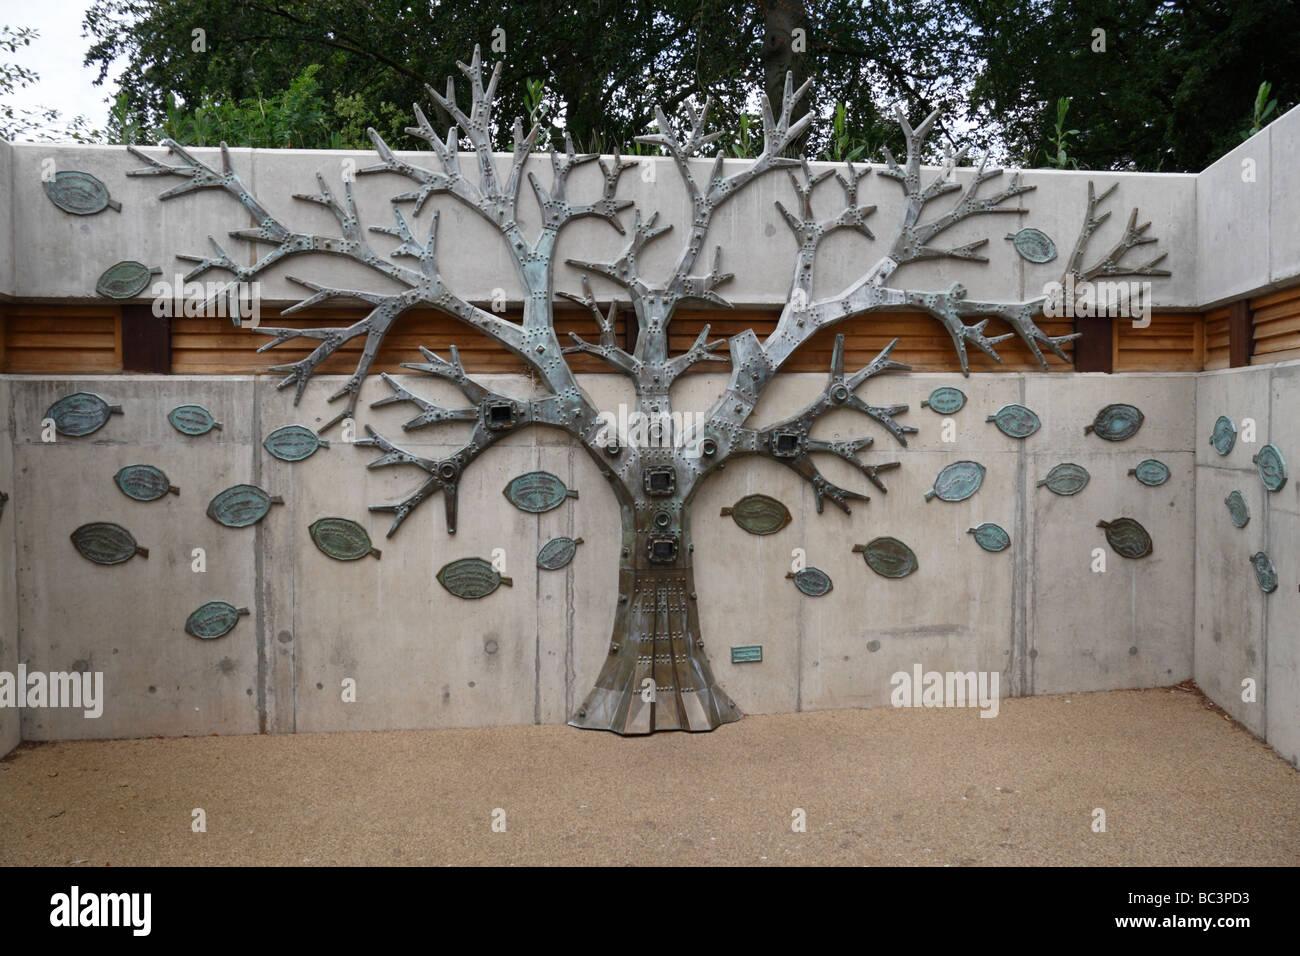 A tree-like sculpture on the Rhizotron beneath the Xstrata treetop walkway, Royal Botanic Gardens, Kew, England. - Stock Image